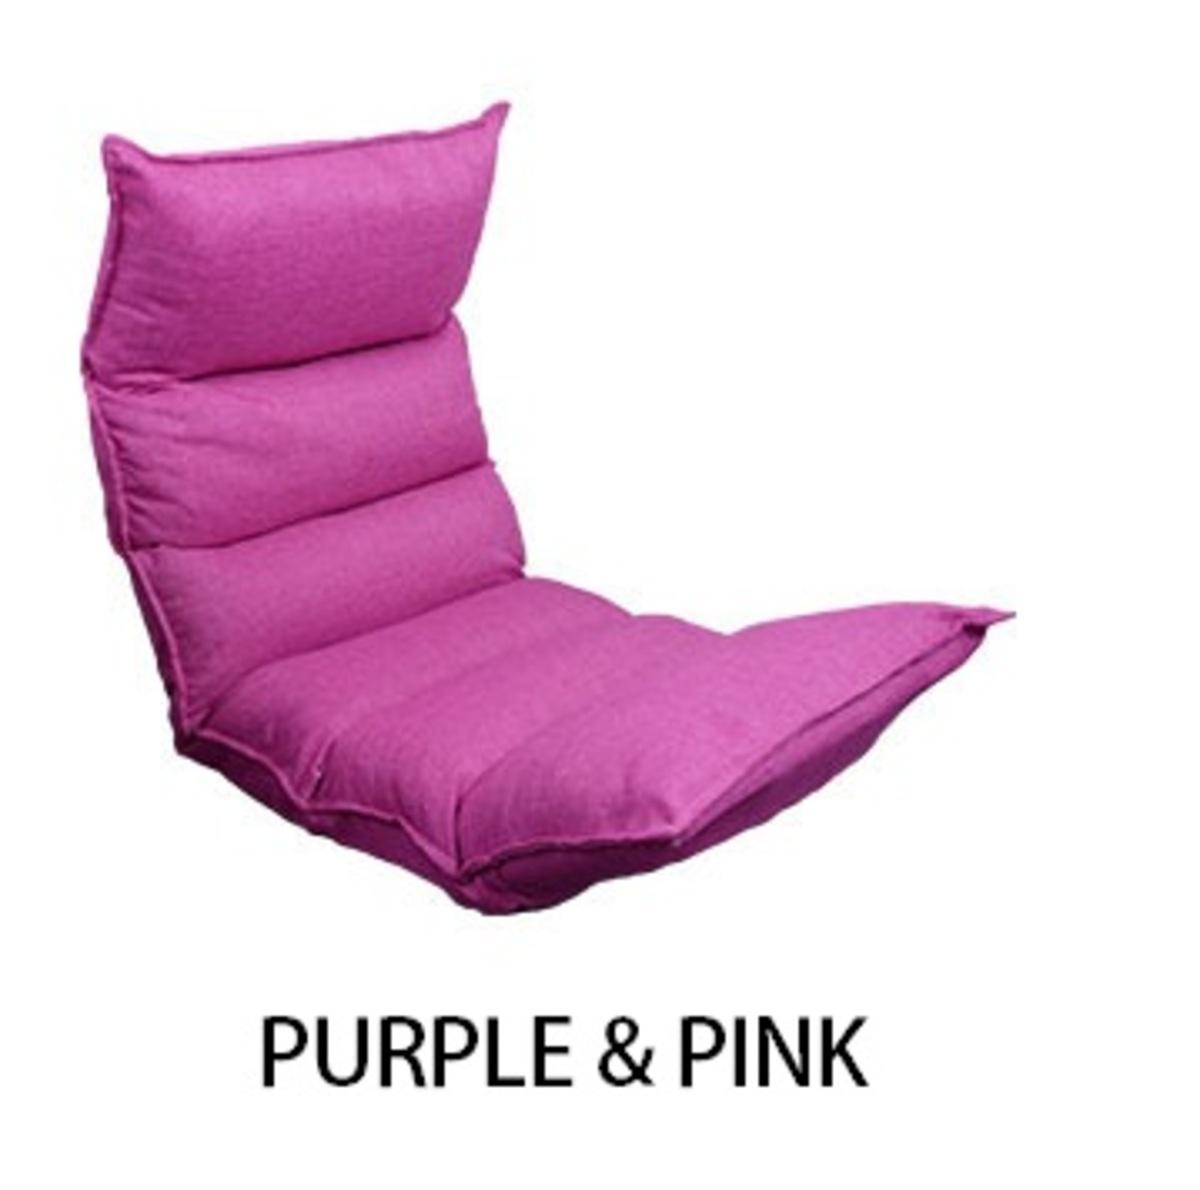 LH011PP Angel Adjustable Lazy Sofa (Purple&Pink color)